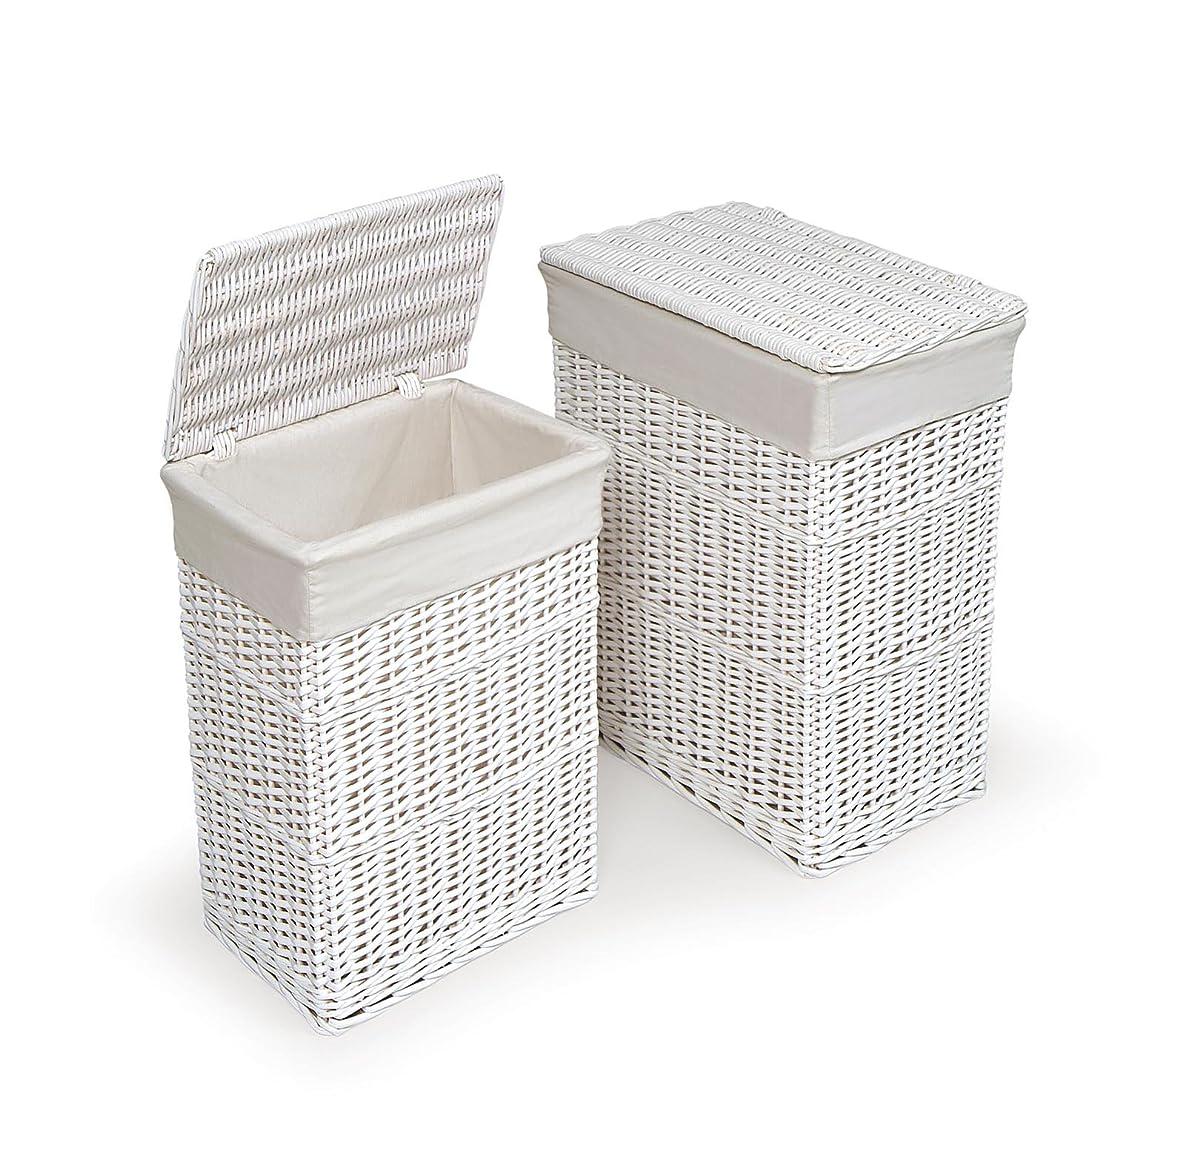 Badger Basket Two Hamper Set with Liners, White